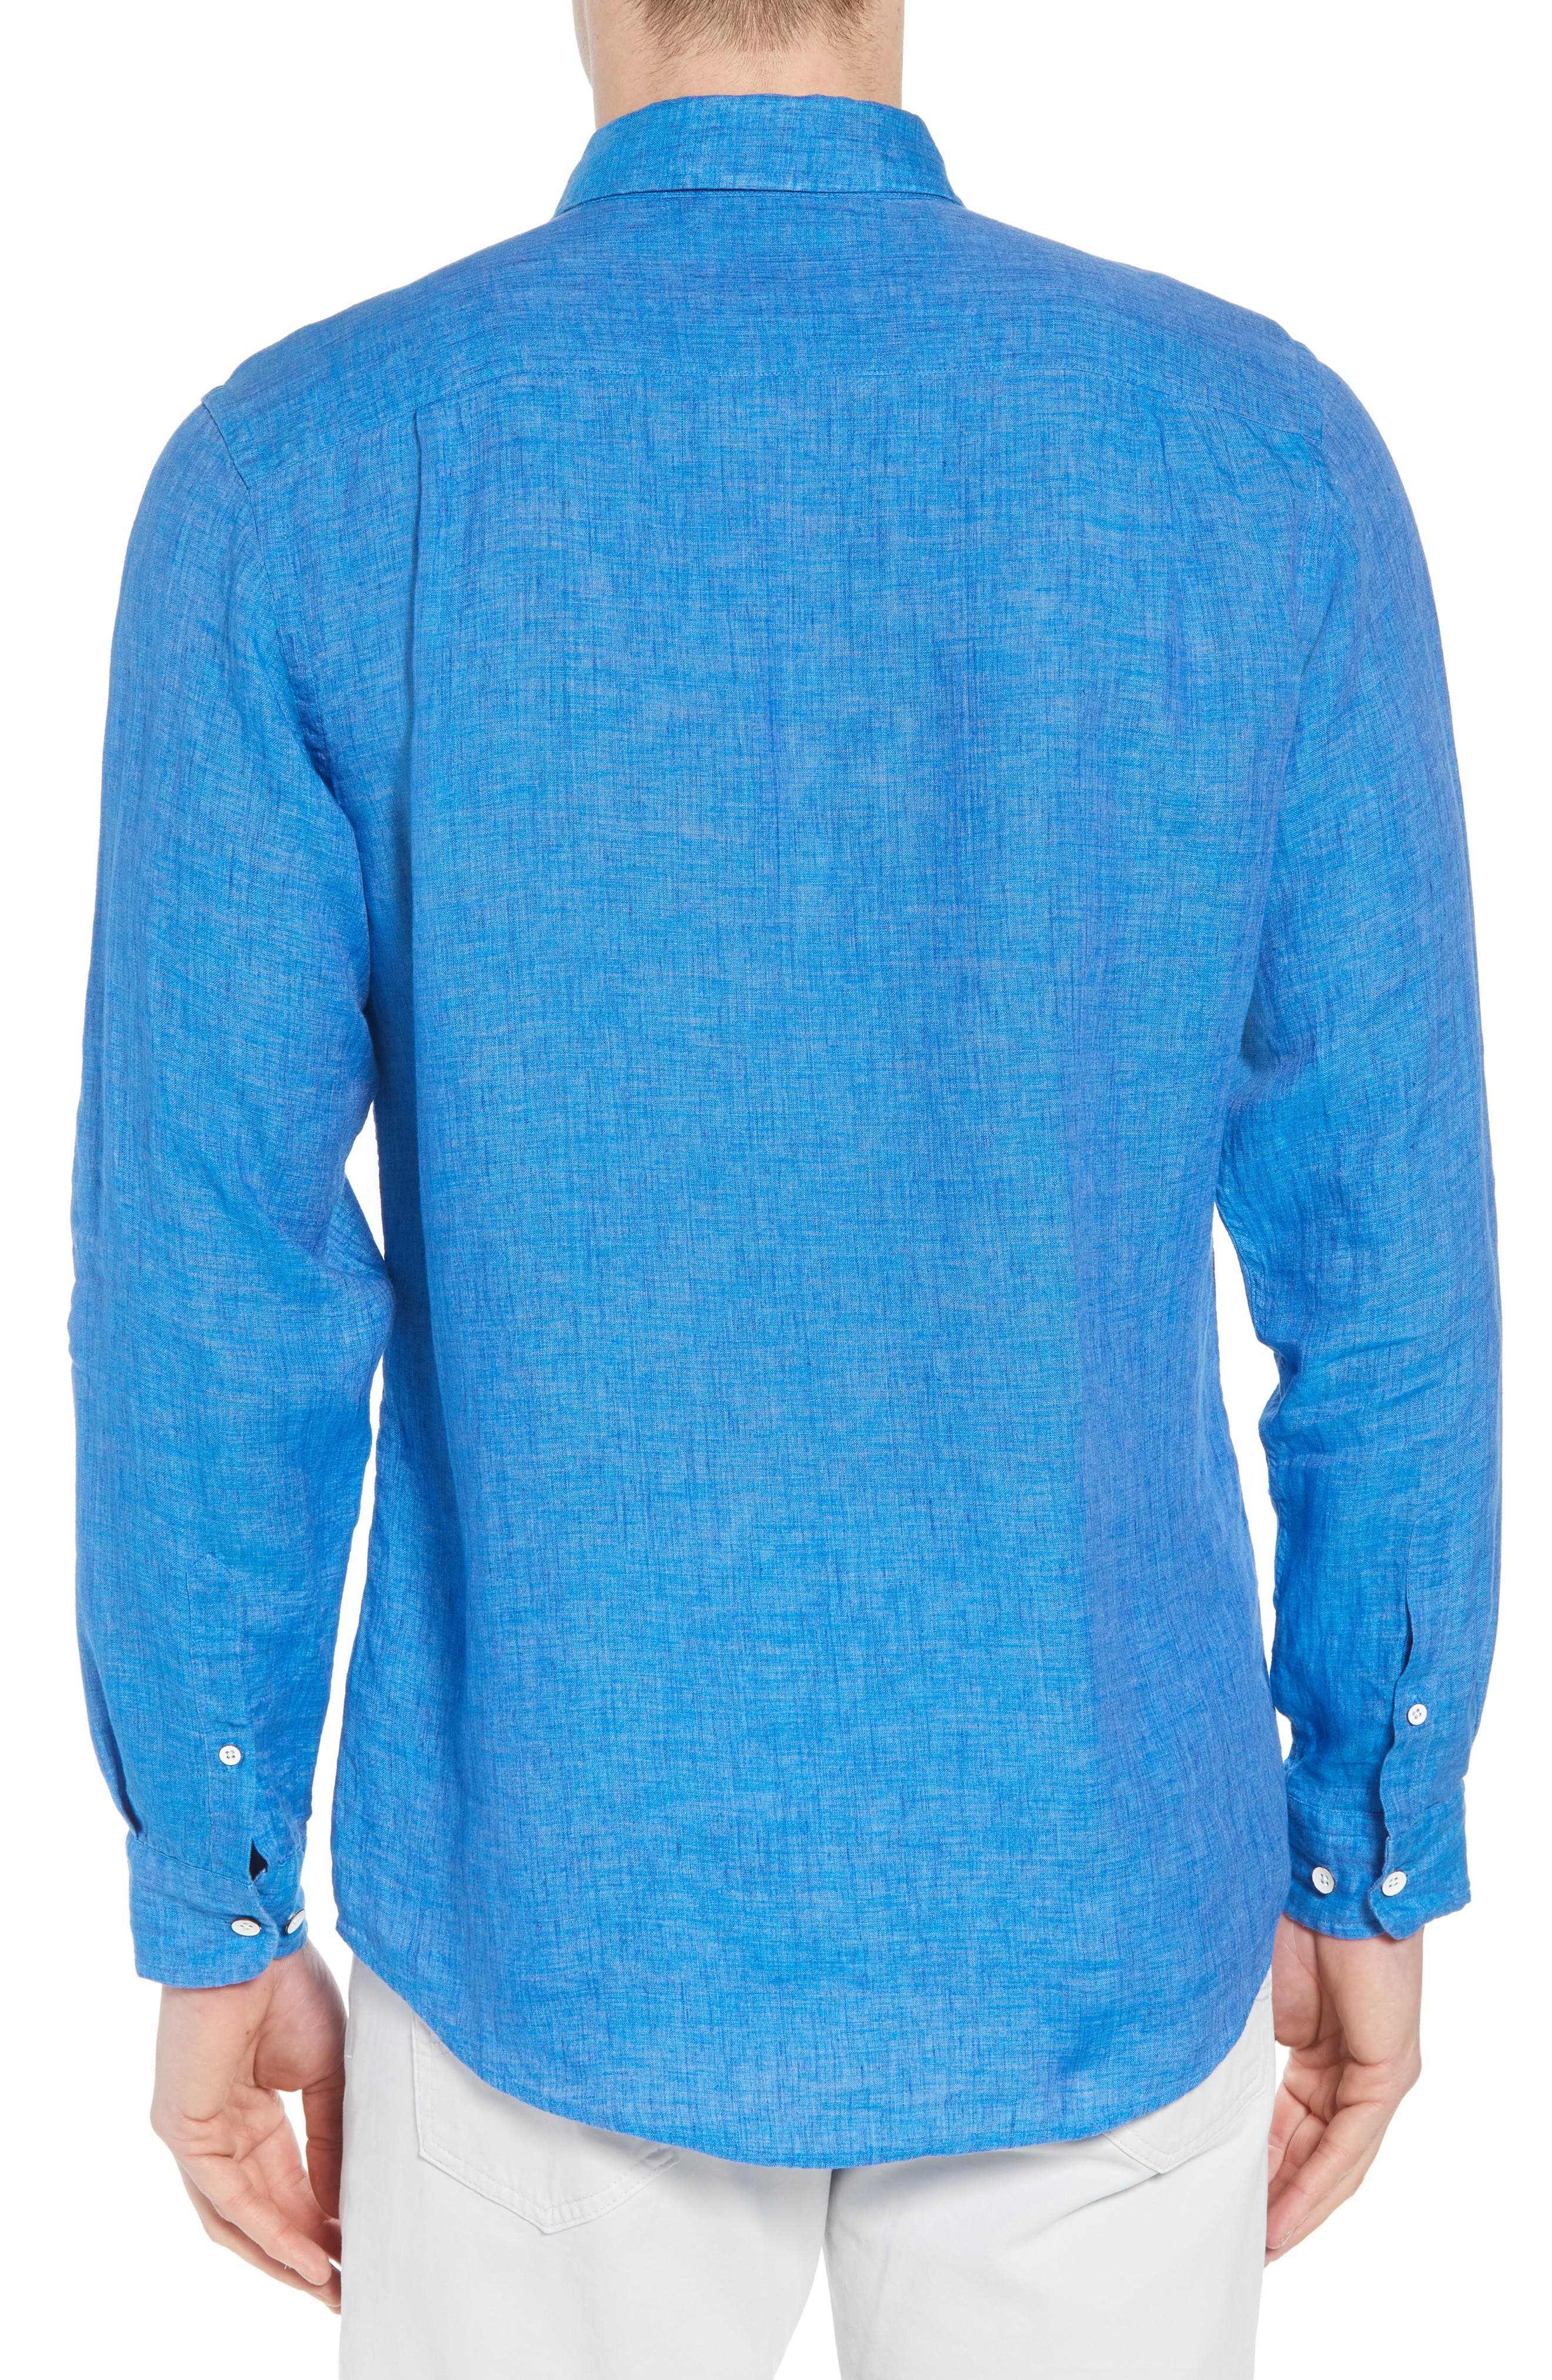 RODD & GUNN,                             Harris Bay Regular Fit Linen Sport Shirt,                             Alternate thumbnail 2, color,                             438